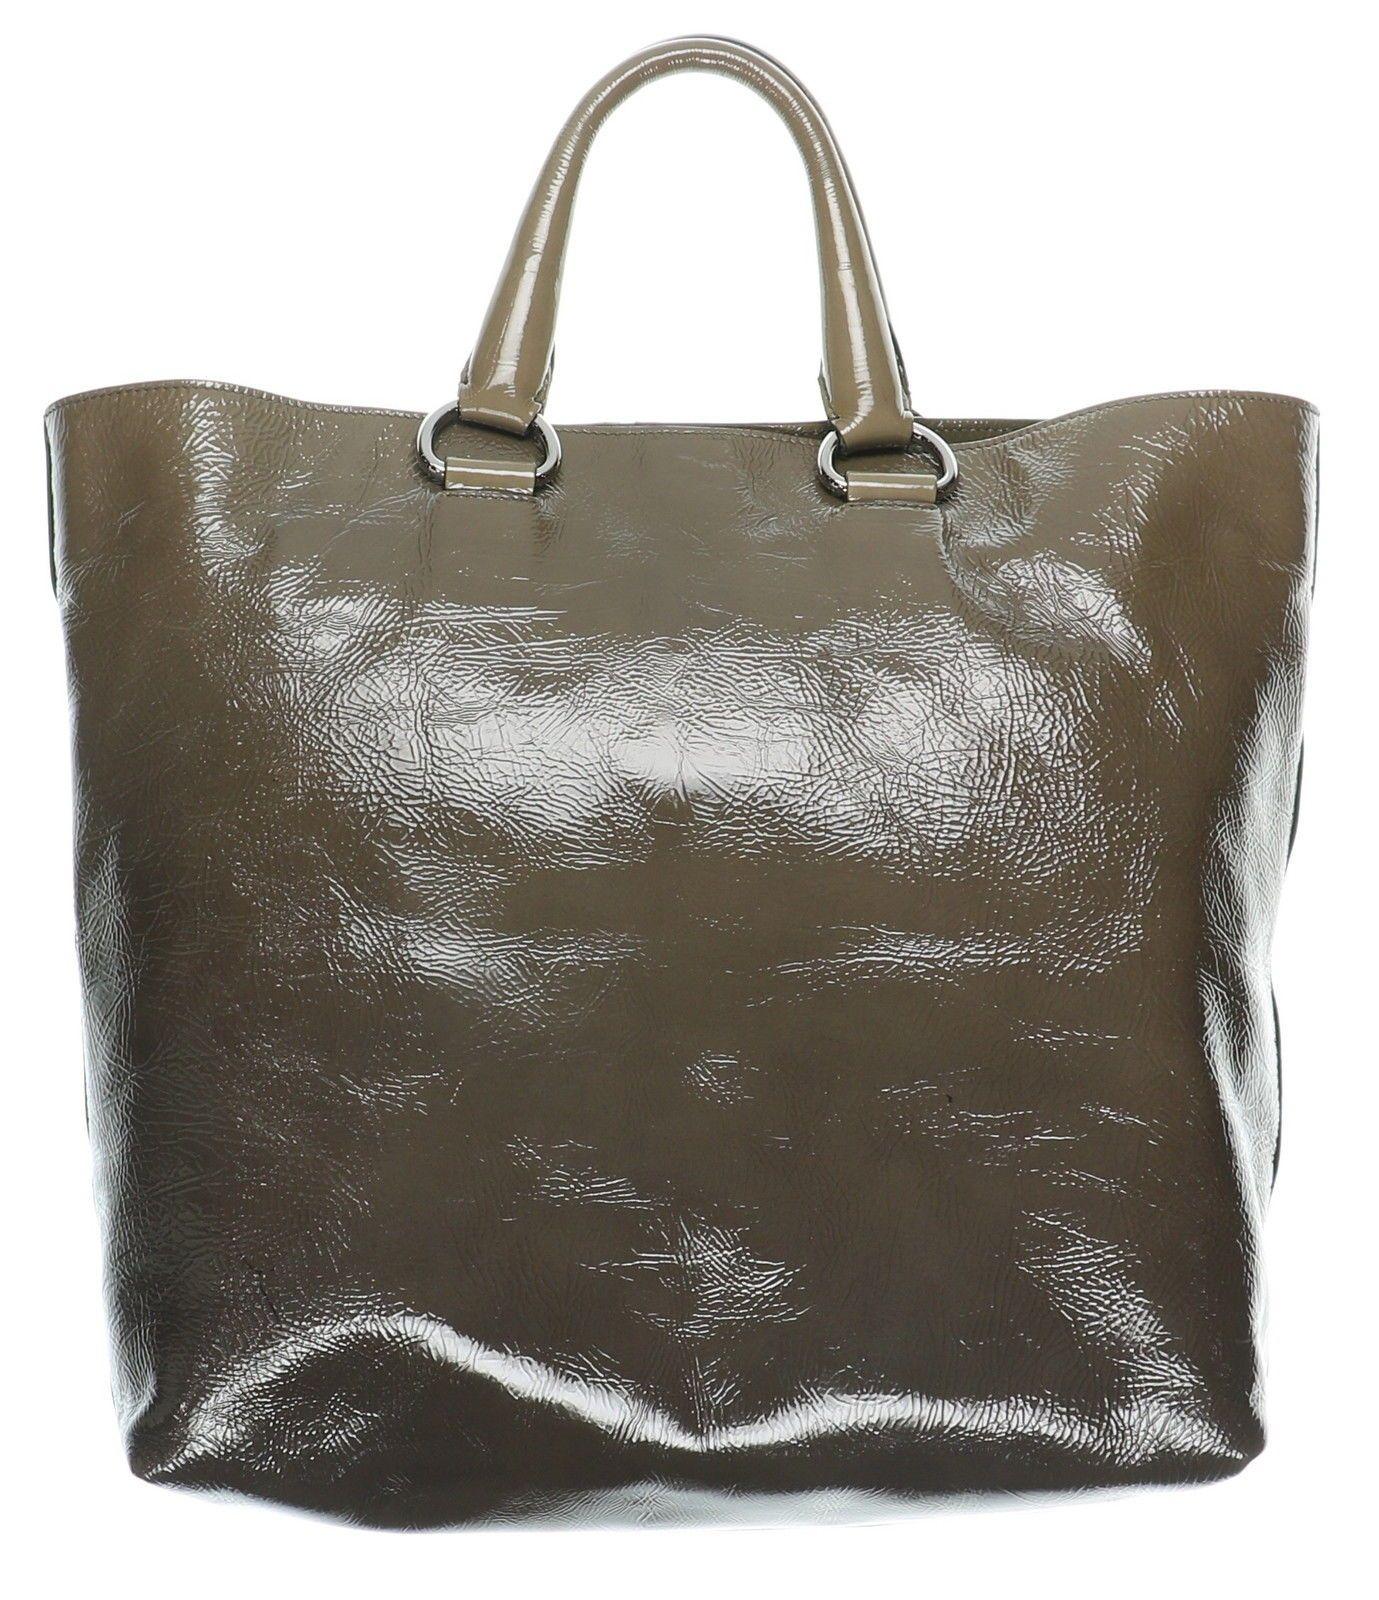 57e947e5d08d13 ... coupon code for womens prada sfumato vernice ombre patent leather tote  bag w double strap 300.99